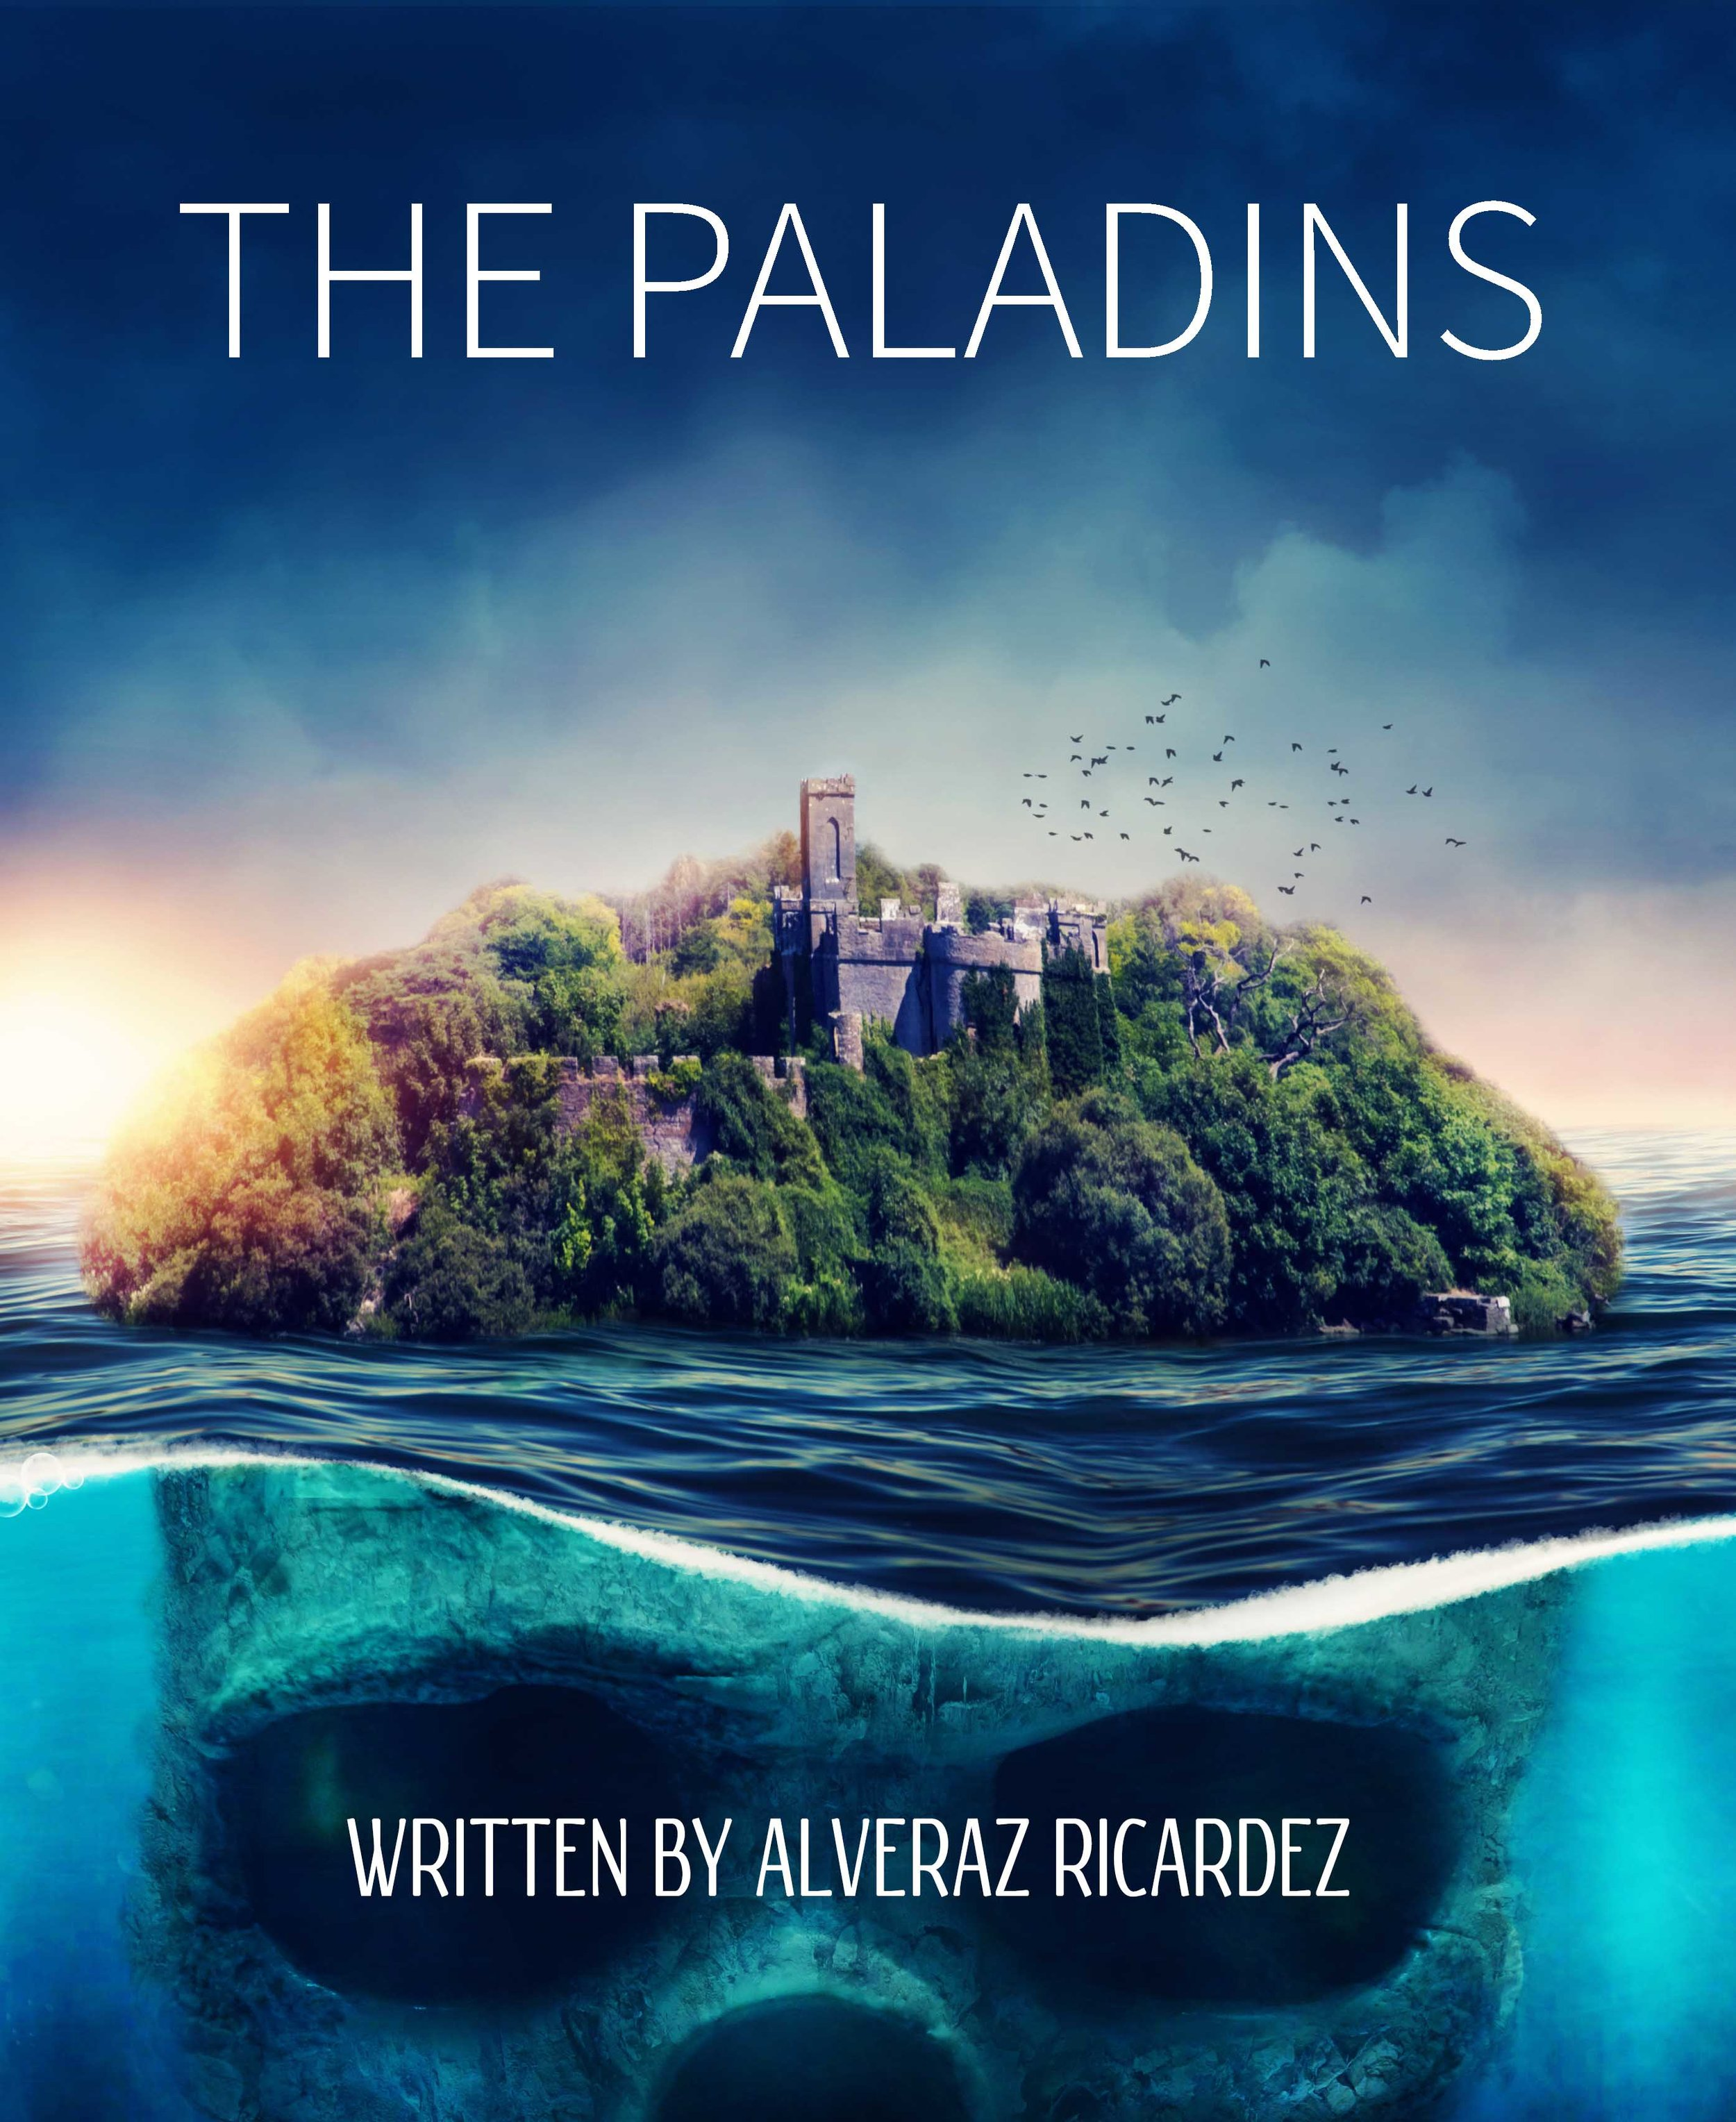 THE PALADINS - Poster.jpg